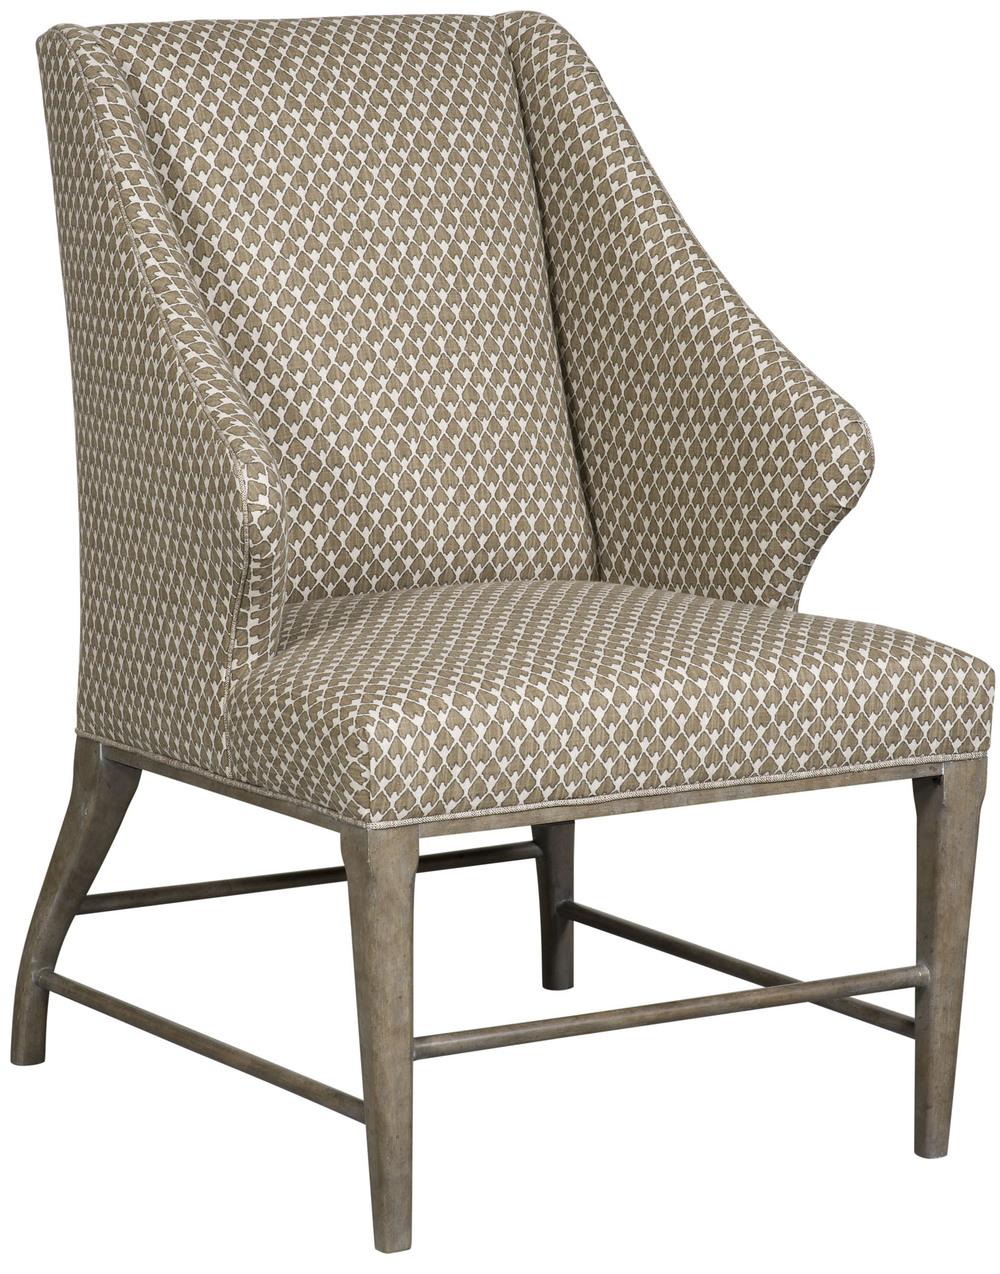 VANGUARD FURNITURE COMPANY - Jordan Dining Arm Chair